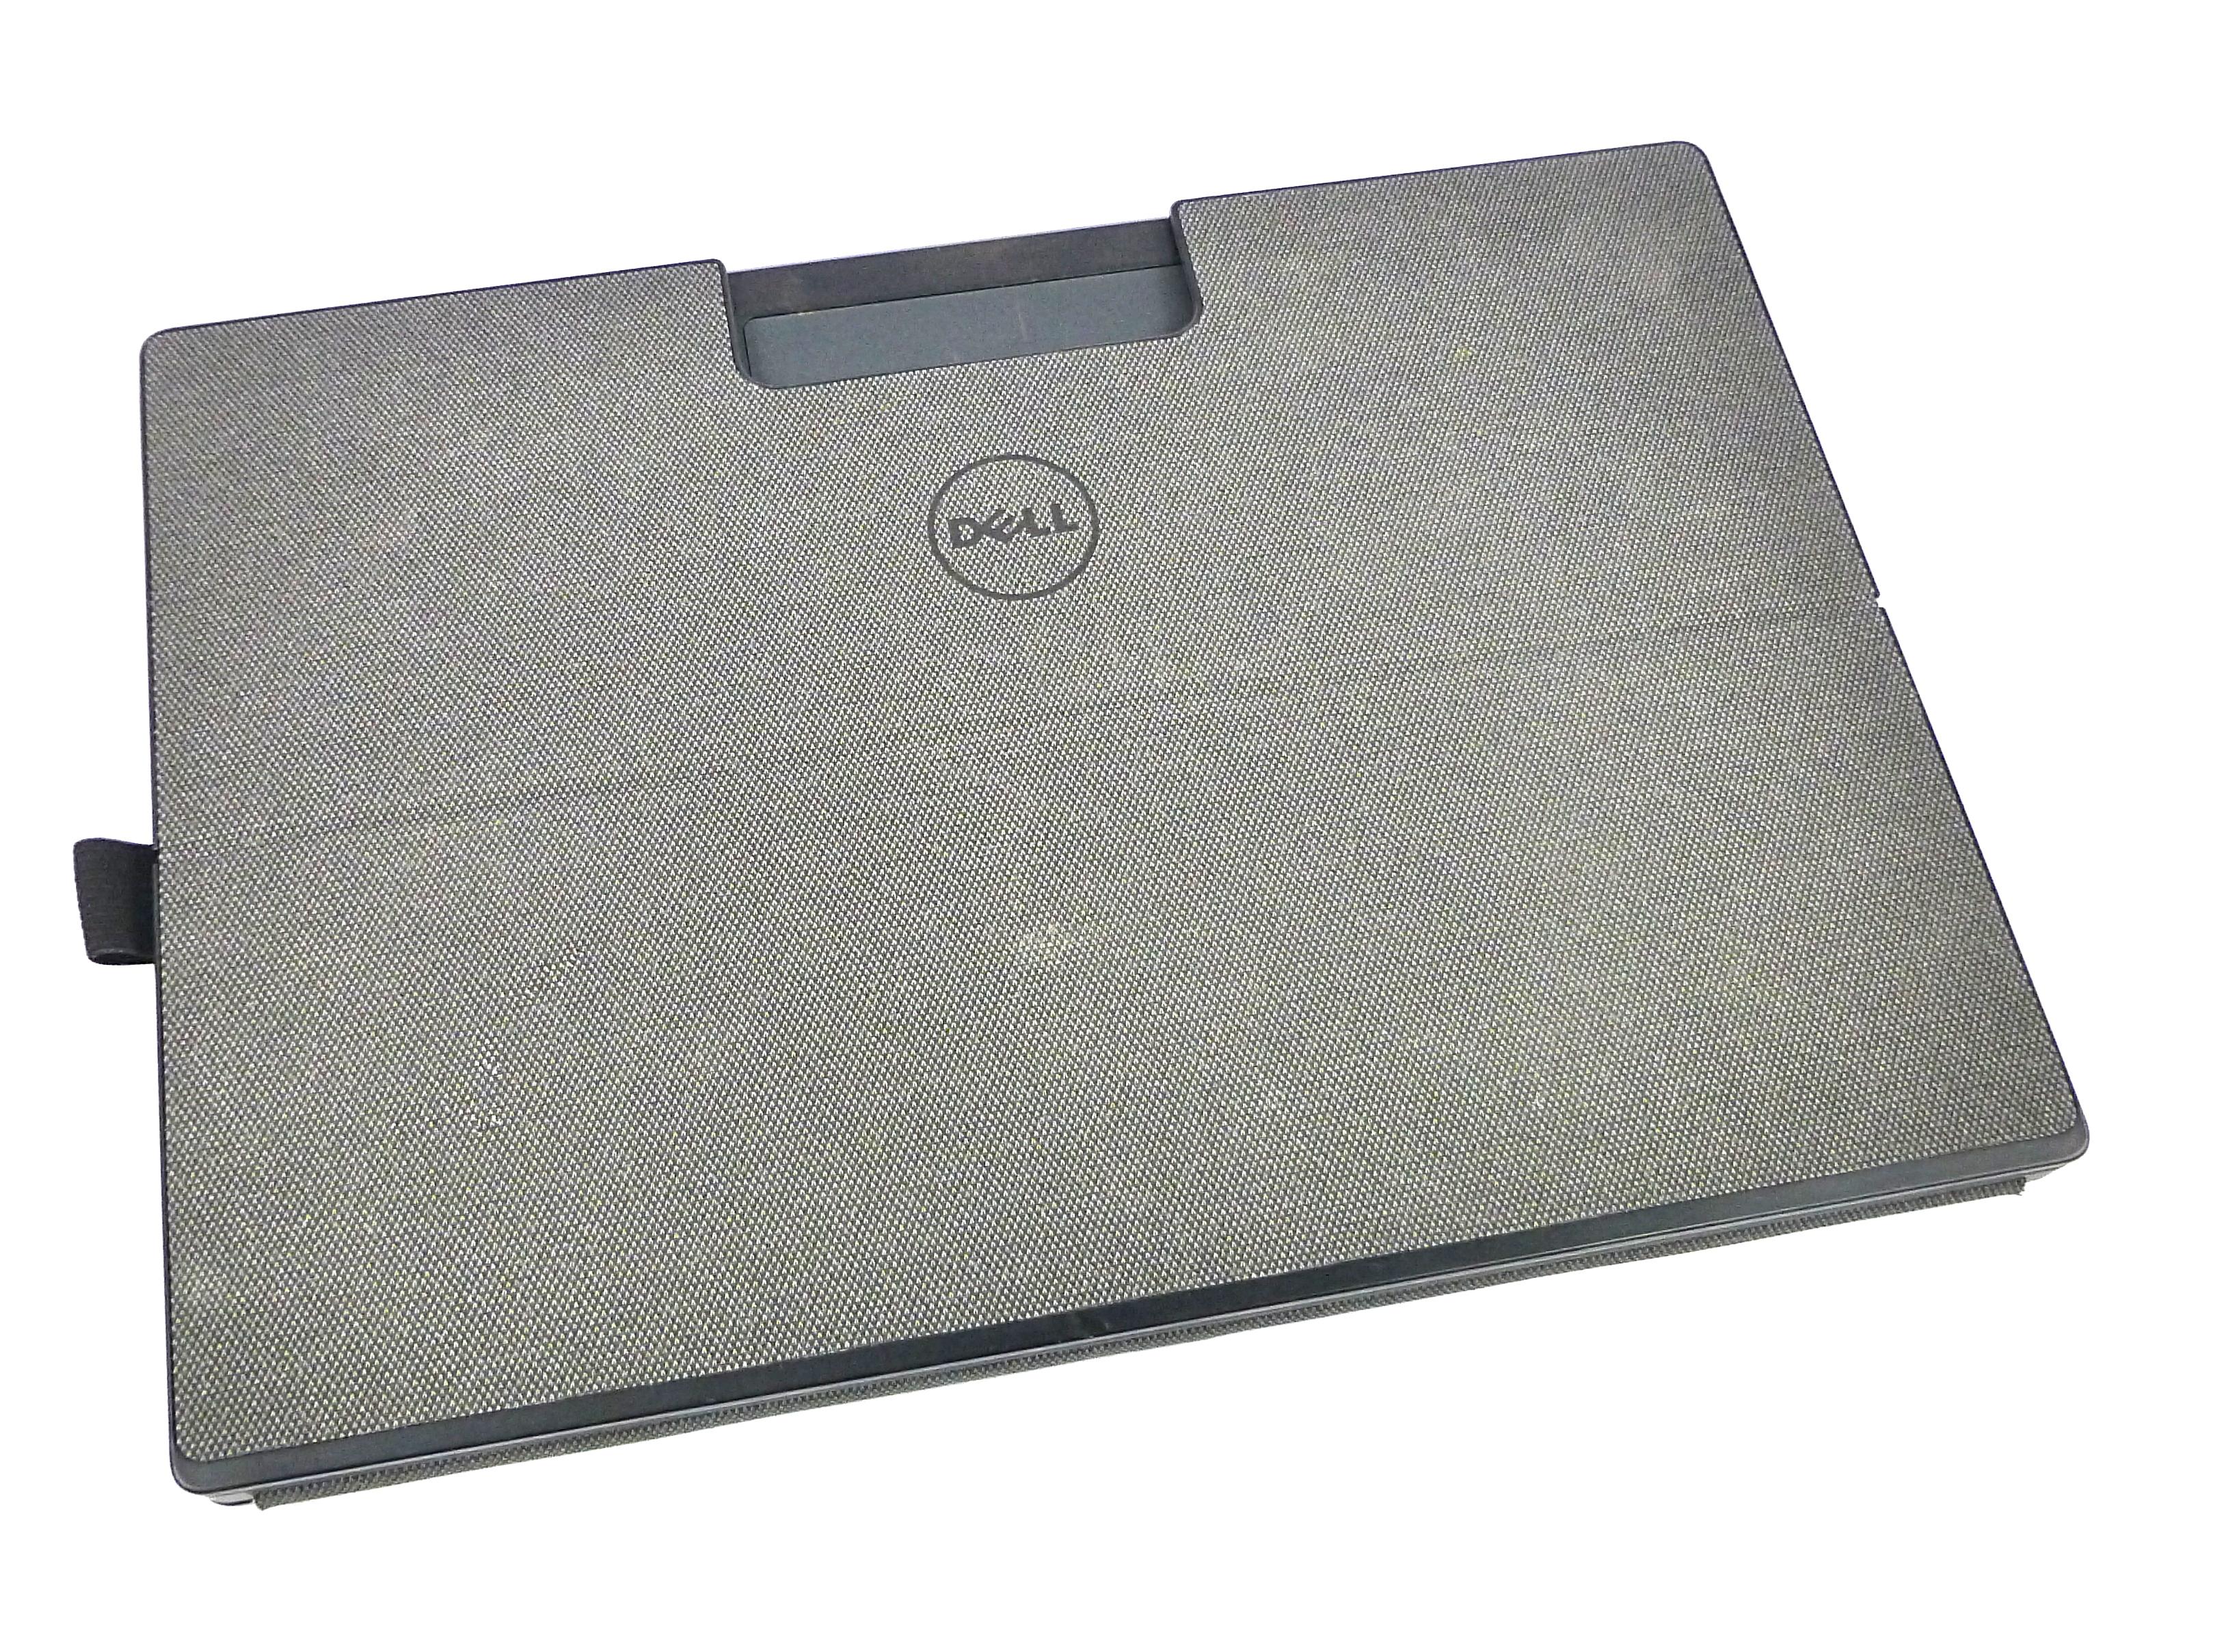 Dell G5RKY Latitude 12 Slim UK Layout Keyboard - Model: K14M